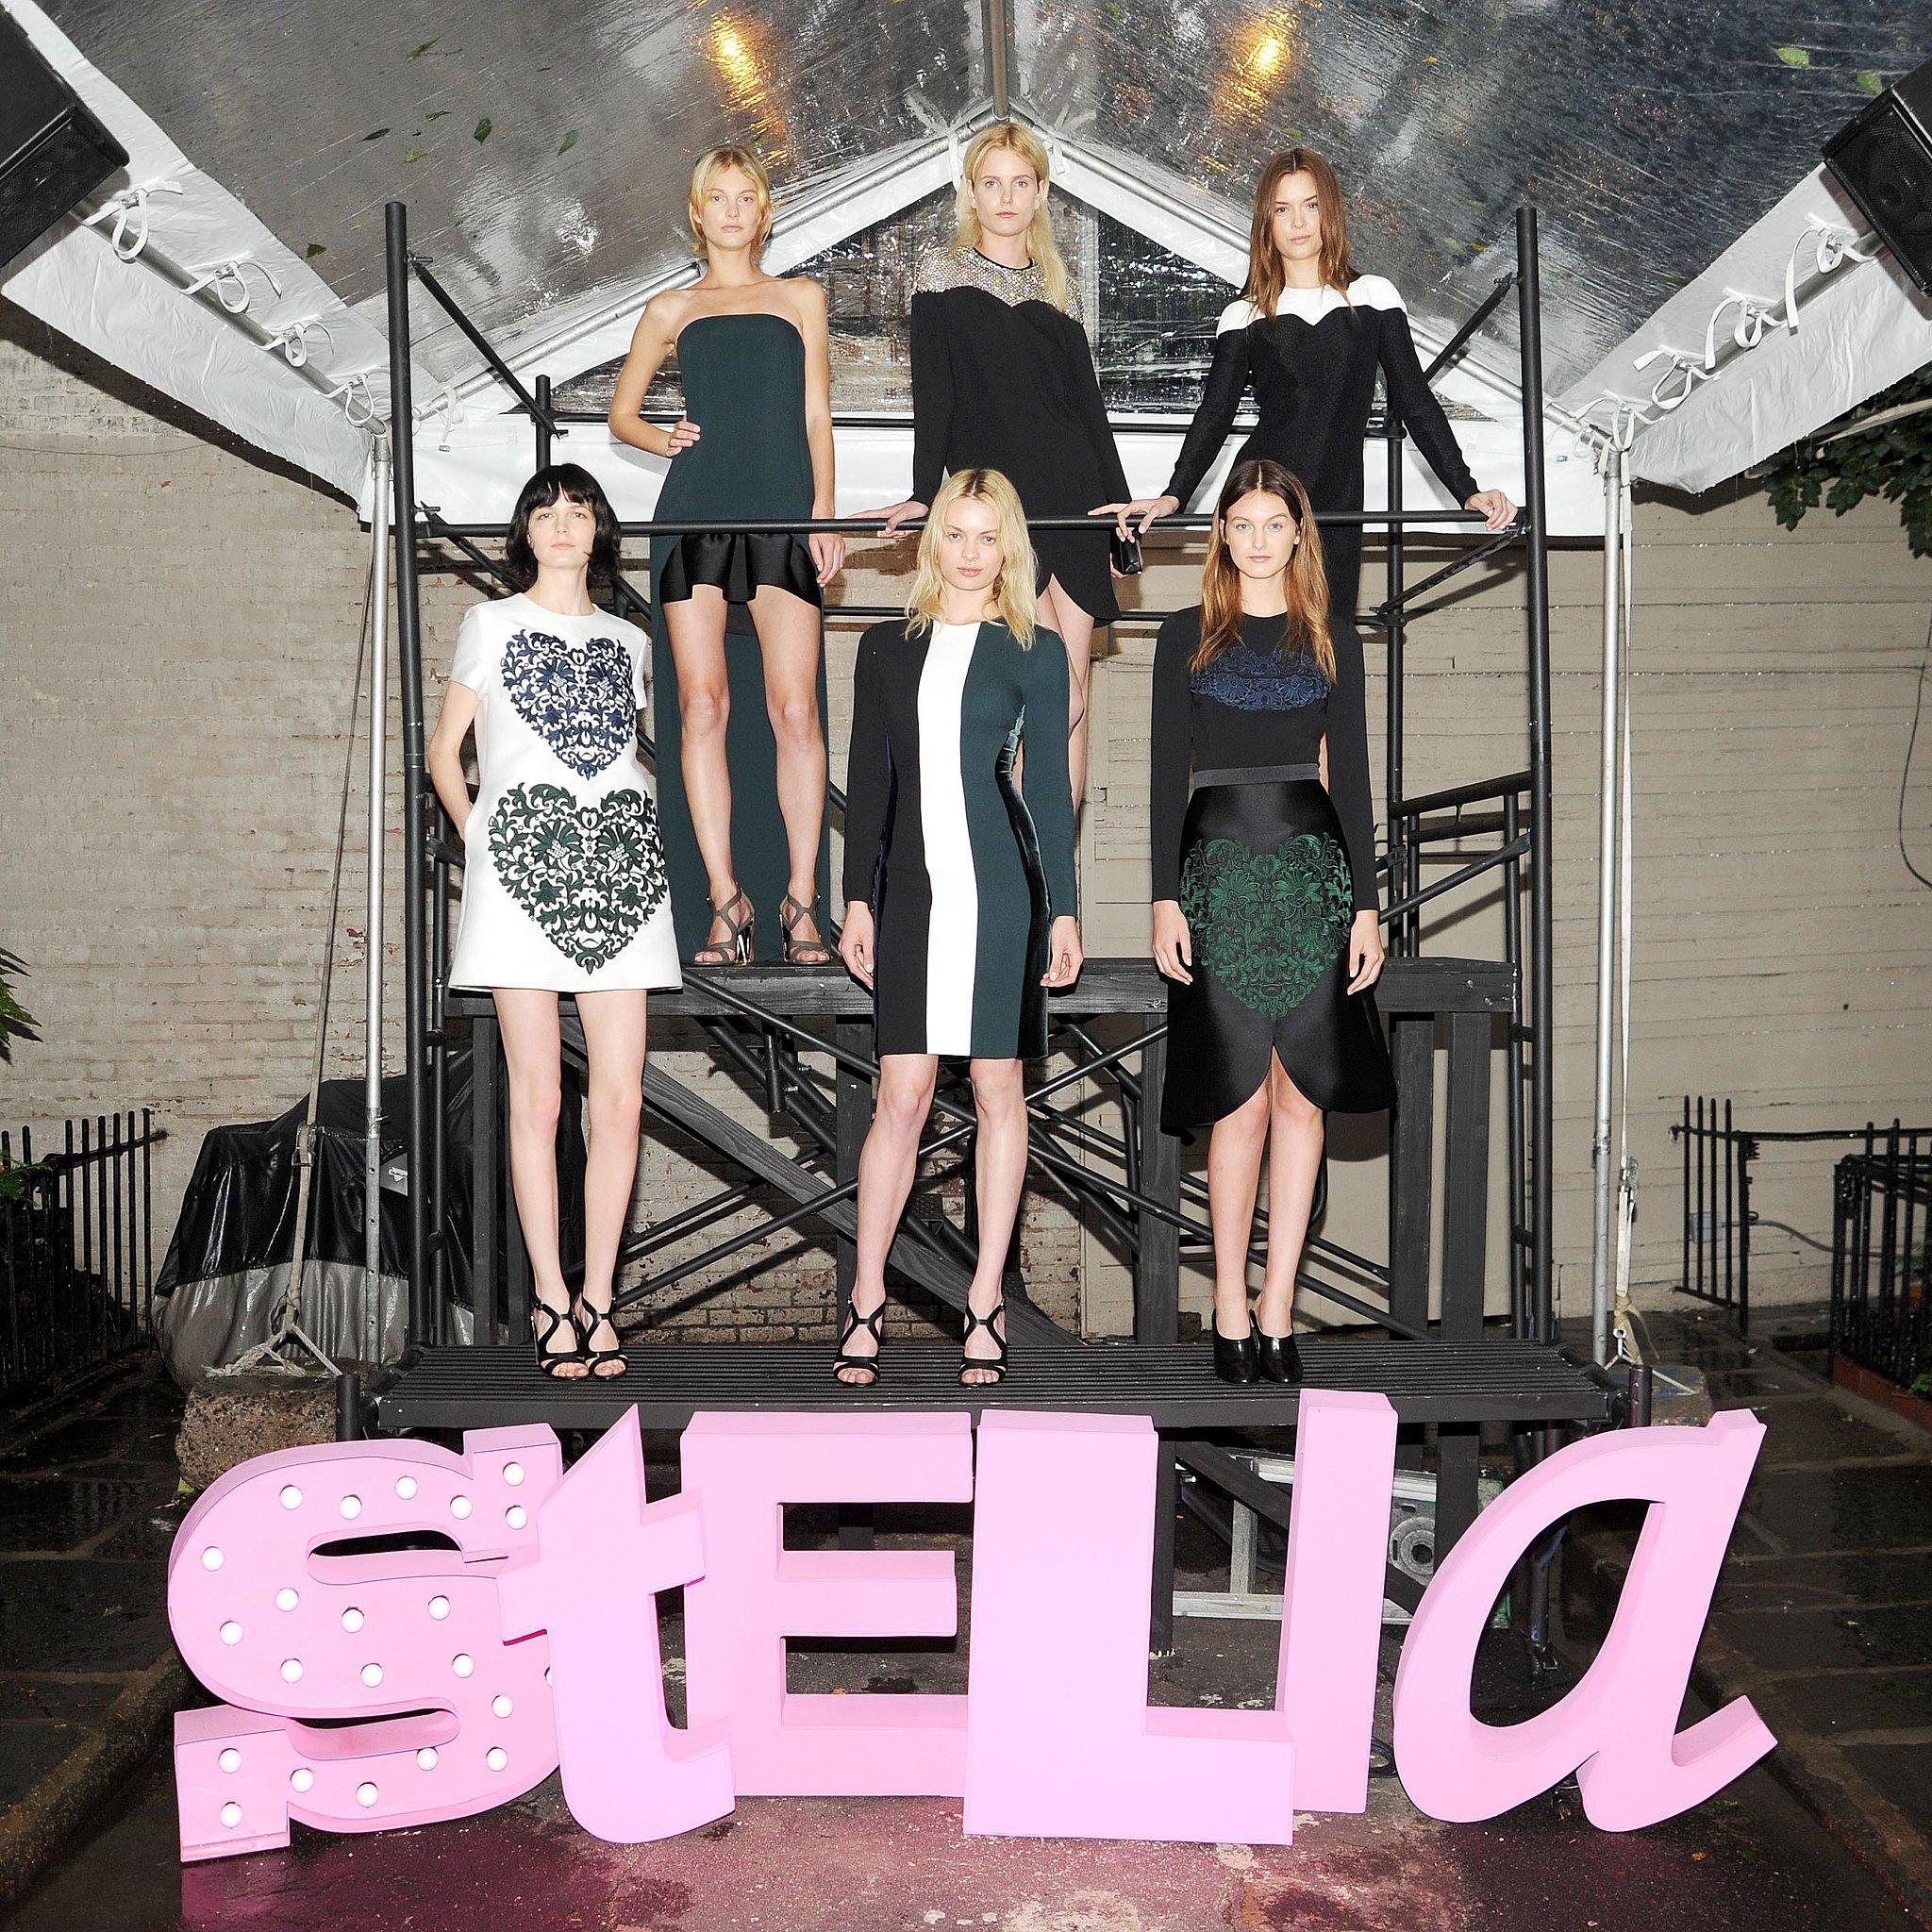 Models at Stella McCartney's Resort 2014 presentation. Source: Billy Farrell/BFAnyc.com